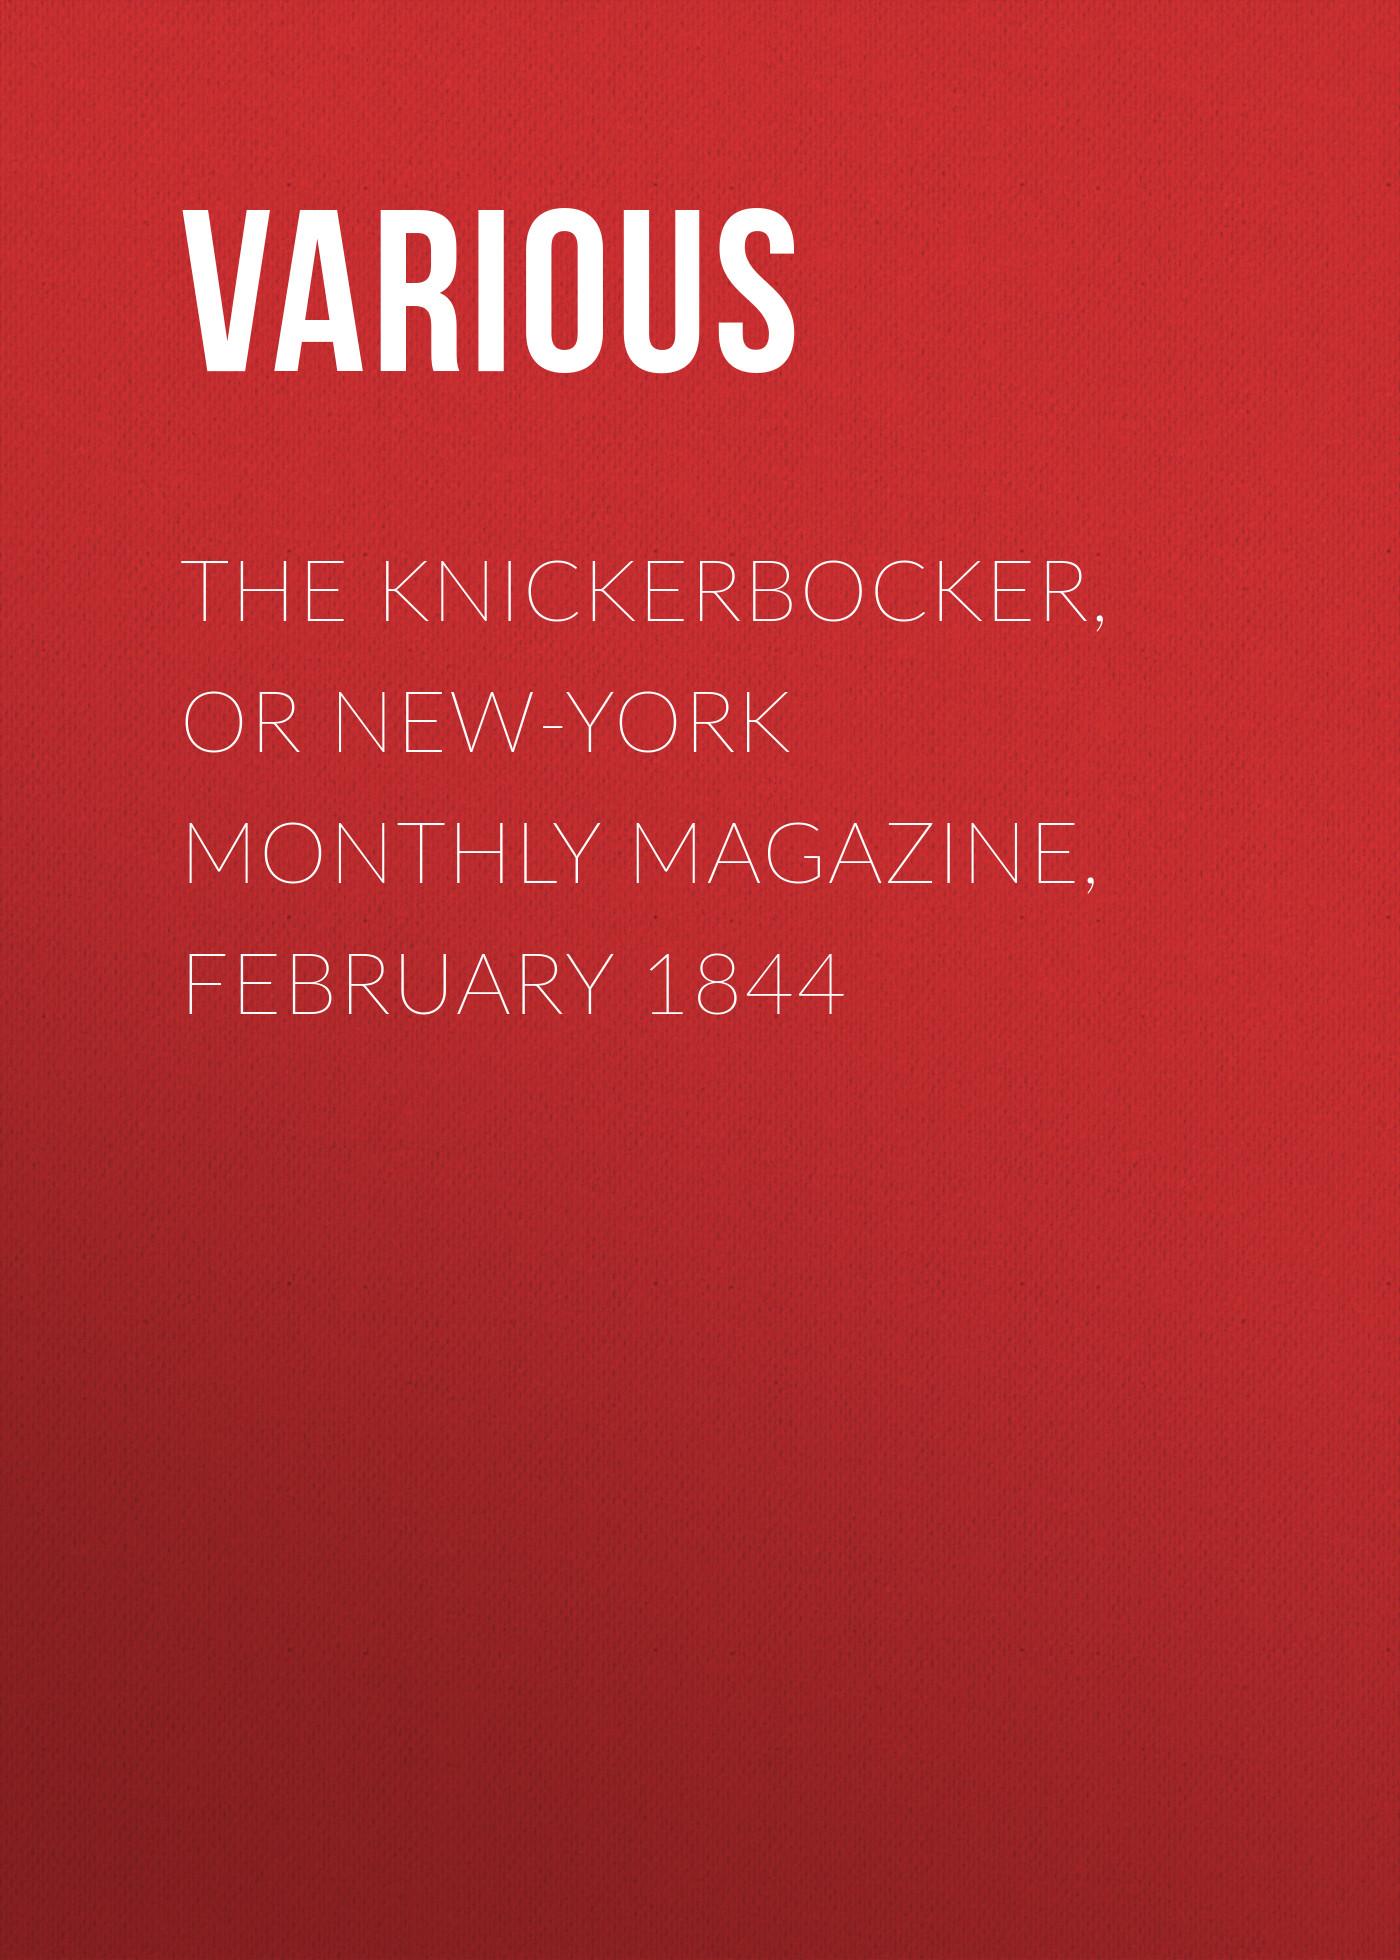 Various The Knickerbocker, or New-York Monthly Magazine, February 1844 maura jacobson new york magazine crosswords volume 7